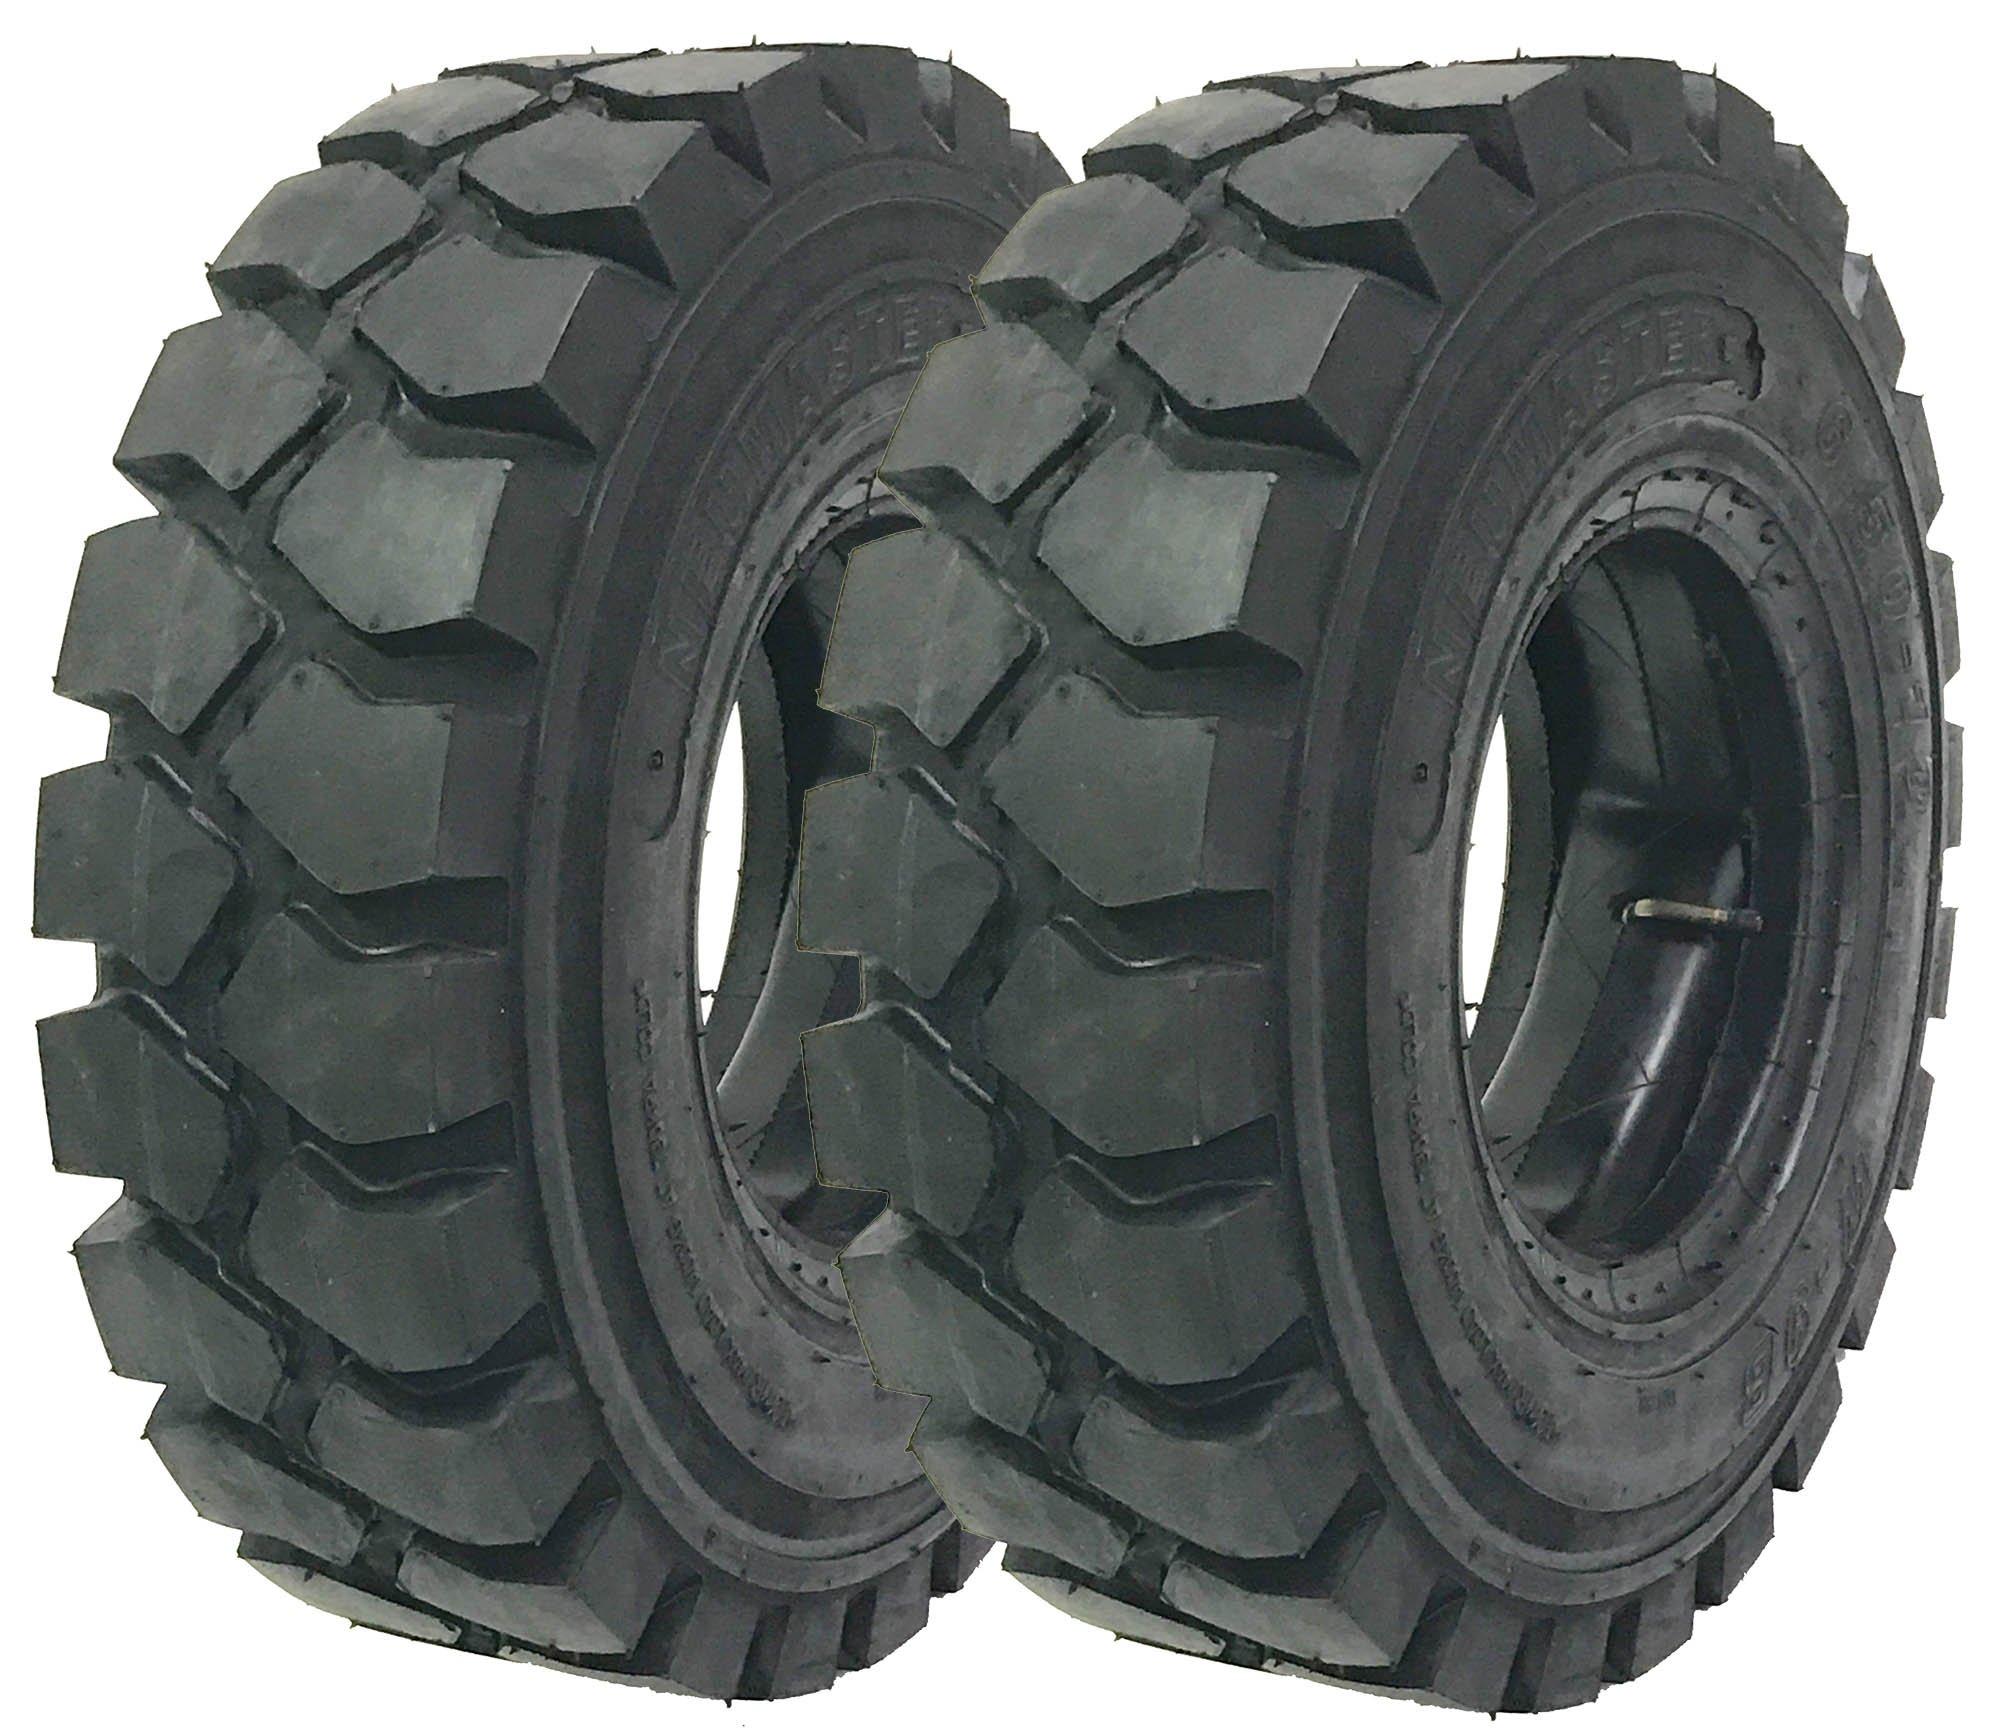 2 New Zeemax Heavy Duty 5.00-8 /10TT Forklift Tires w/Tube & Flap Rim Guard by ZEEMAX (Image #1)